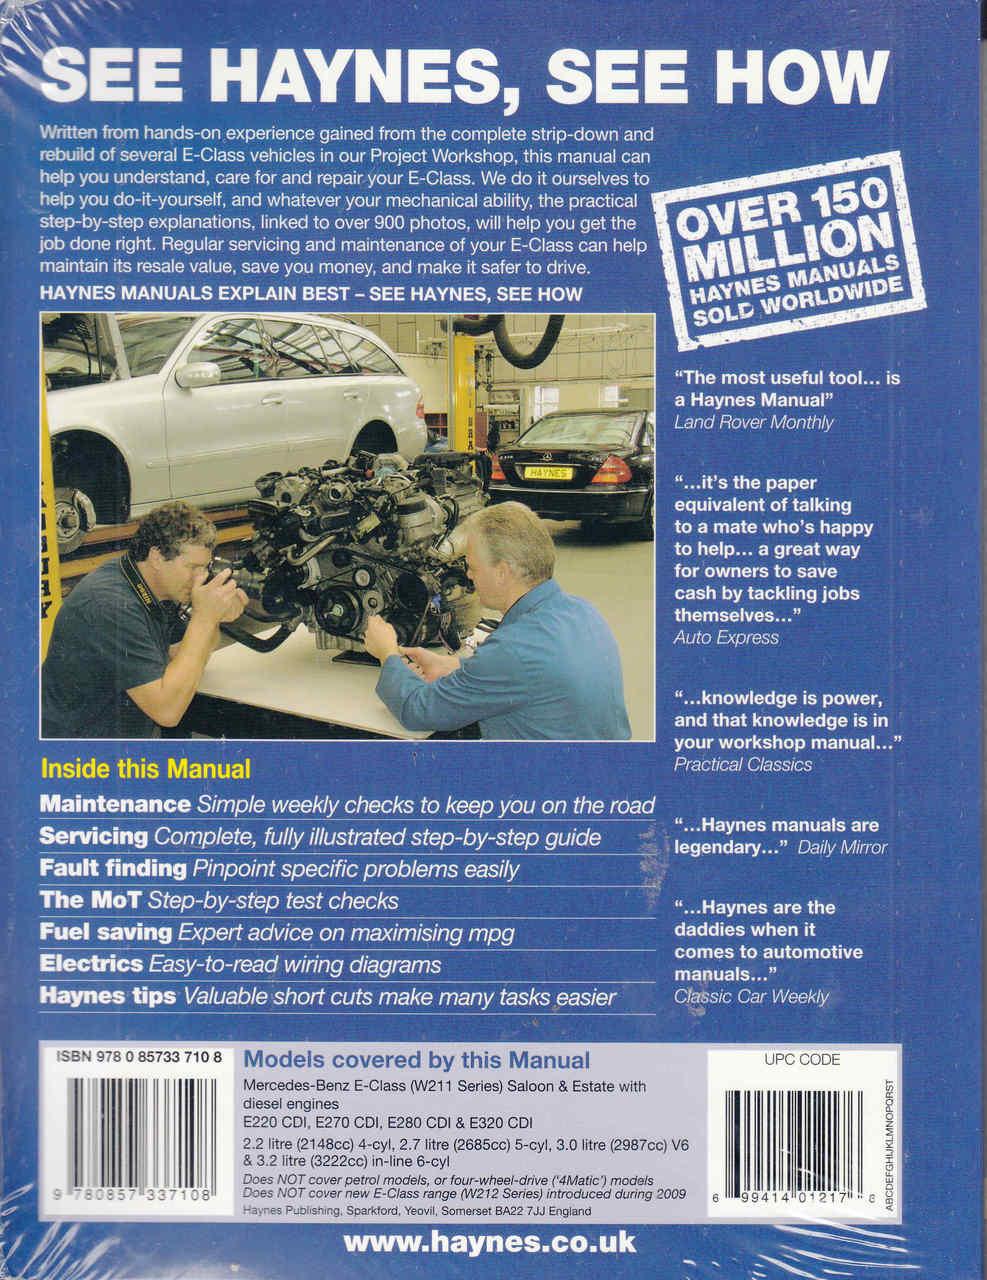 Mercedes-Benz E-Class (W211 Series) Diesel 2002-2010 Workshop Manual